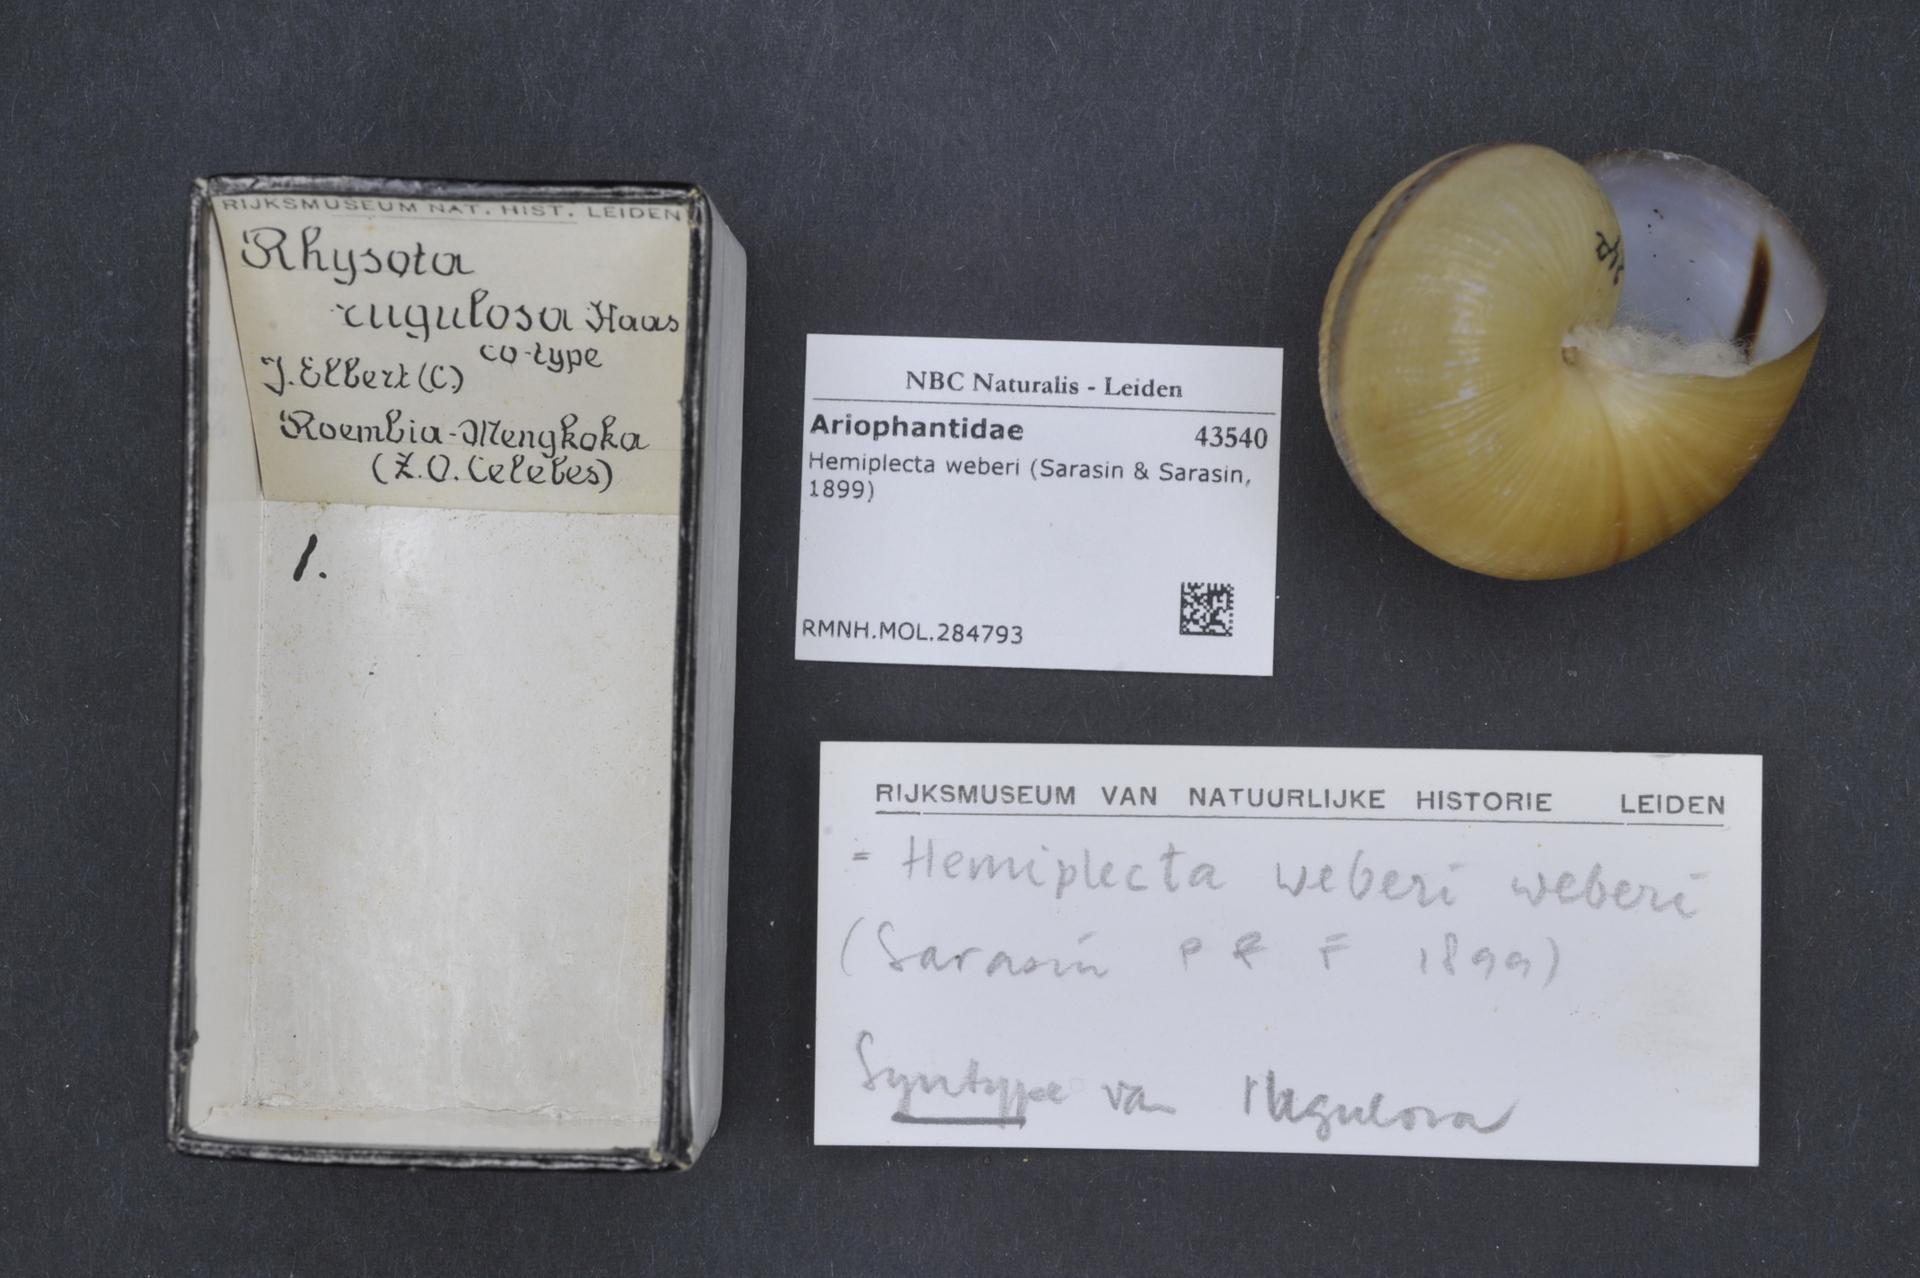 RMNH.MOL.284793 | Hemiplecta (Rhysota) rugulosa Haas, 1912